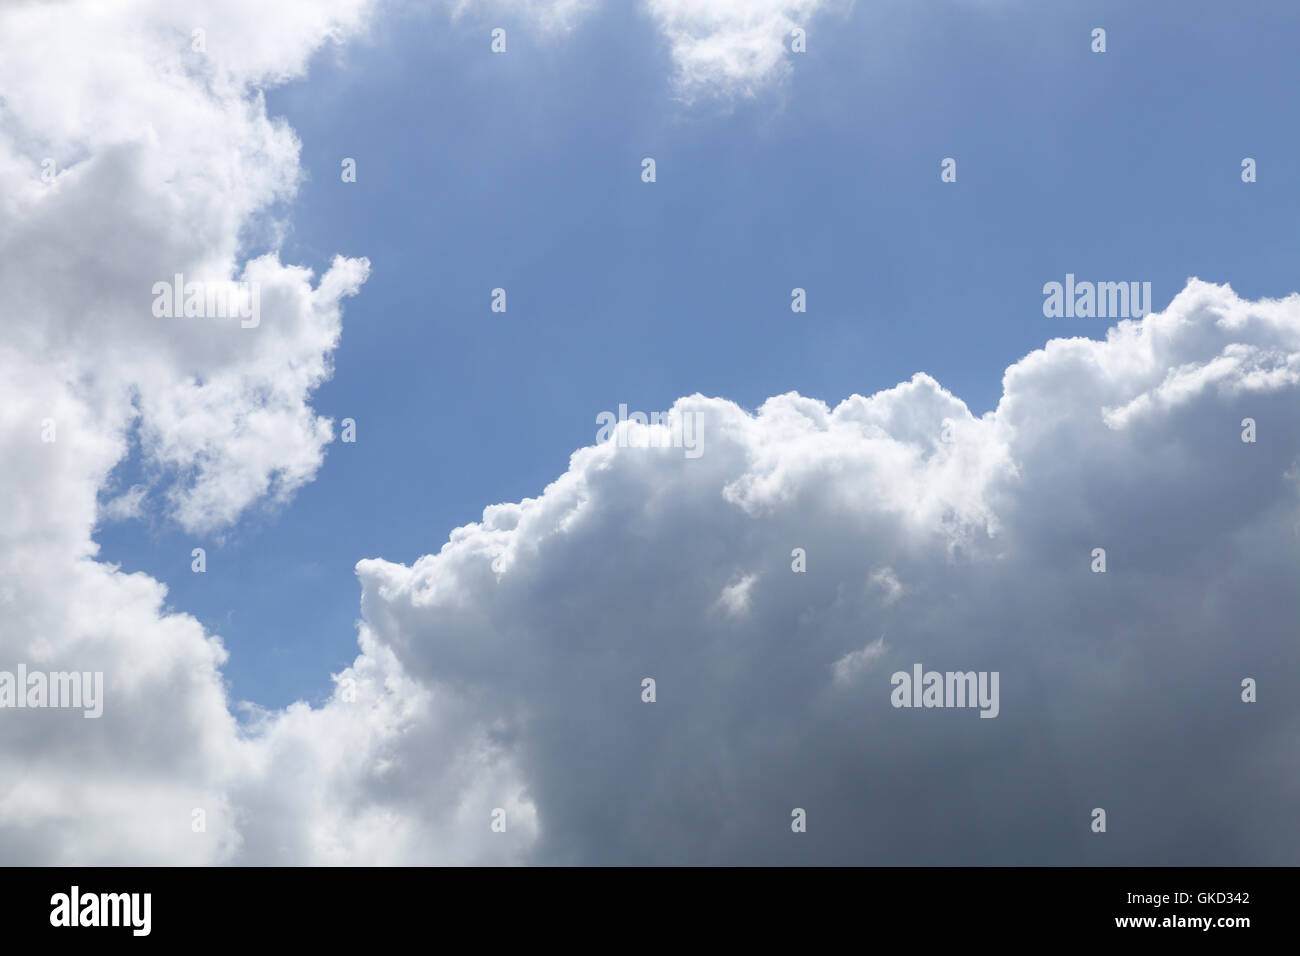 rainy cloud and blue sky background - Stock Image